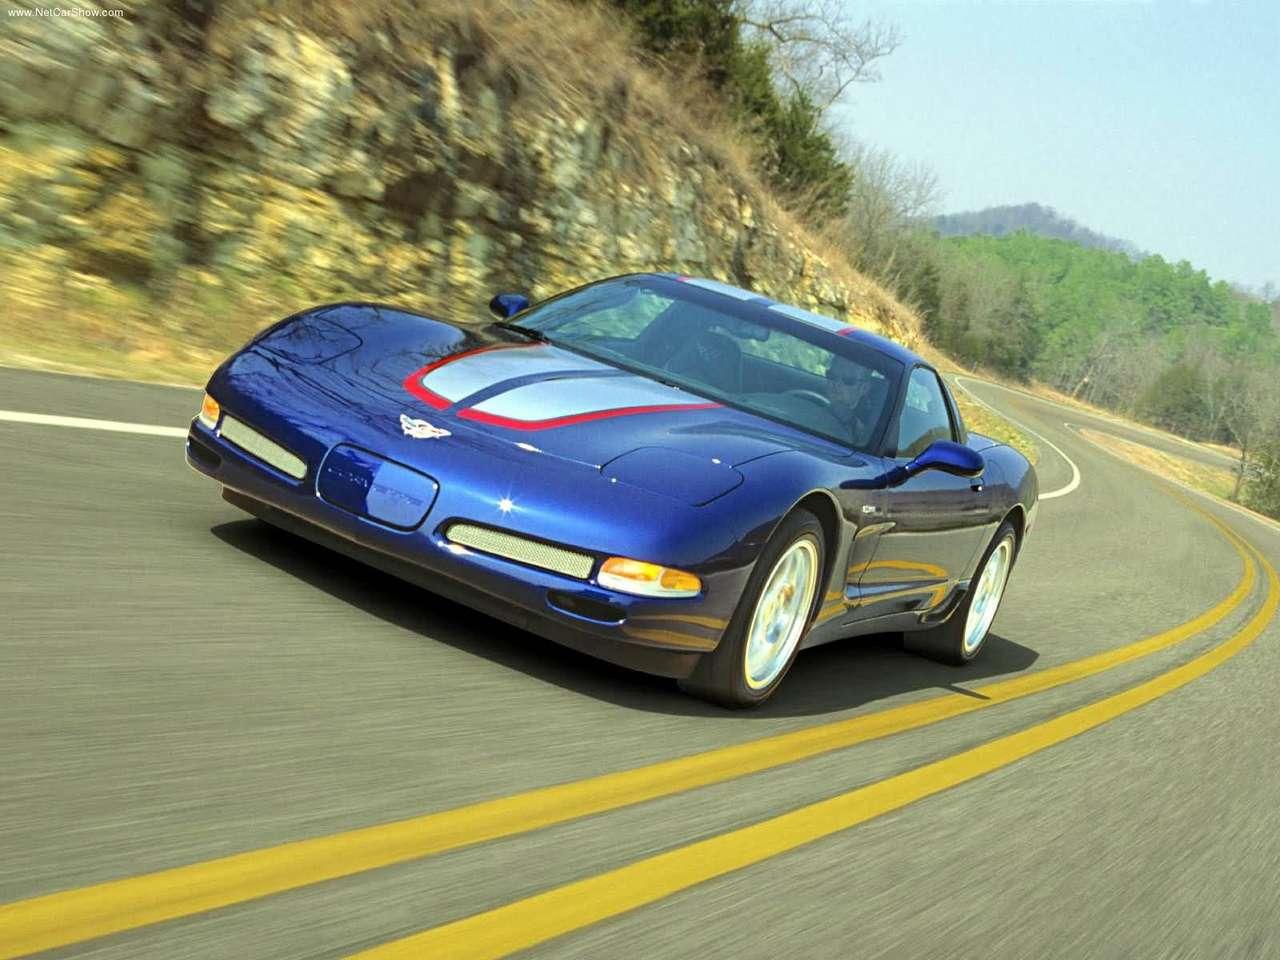 http://2.bp.blogspot.com/-B1eGweJ1eIc/TYCRi22gP7I/AAAAAAAANq8/sFi4X8MaENA/s1600/Chevrolet-Corvette_Z06_Commemorative_Edition_2004_1280x960_wallpaper_05.jpg